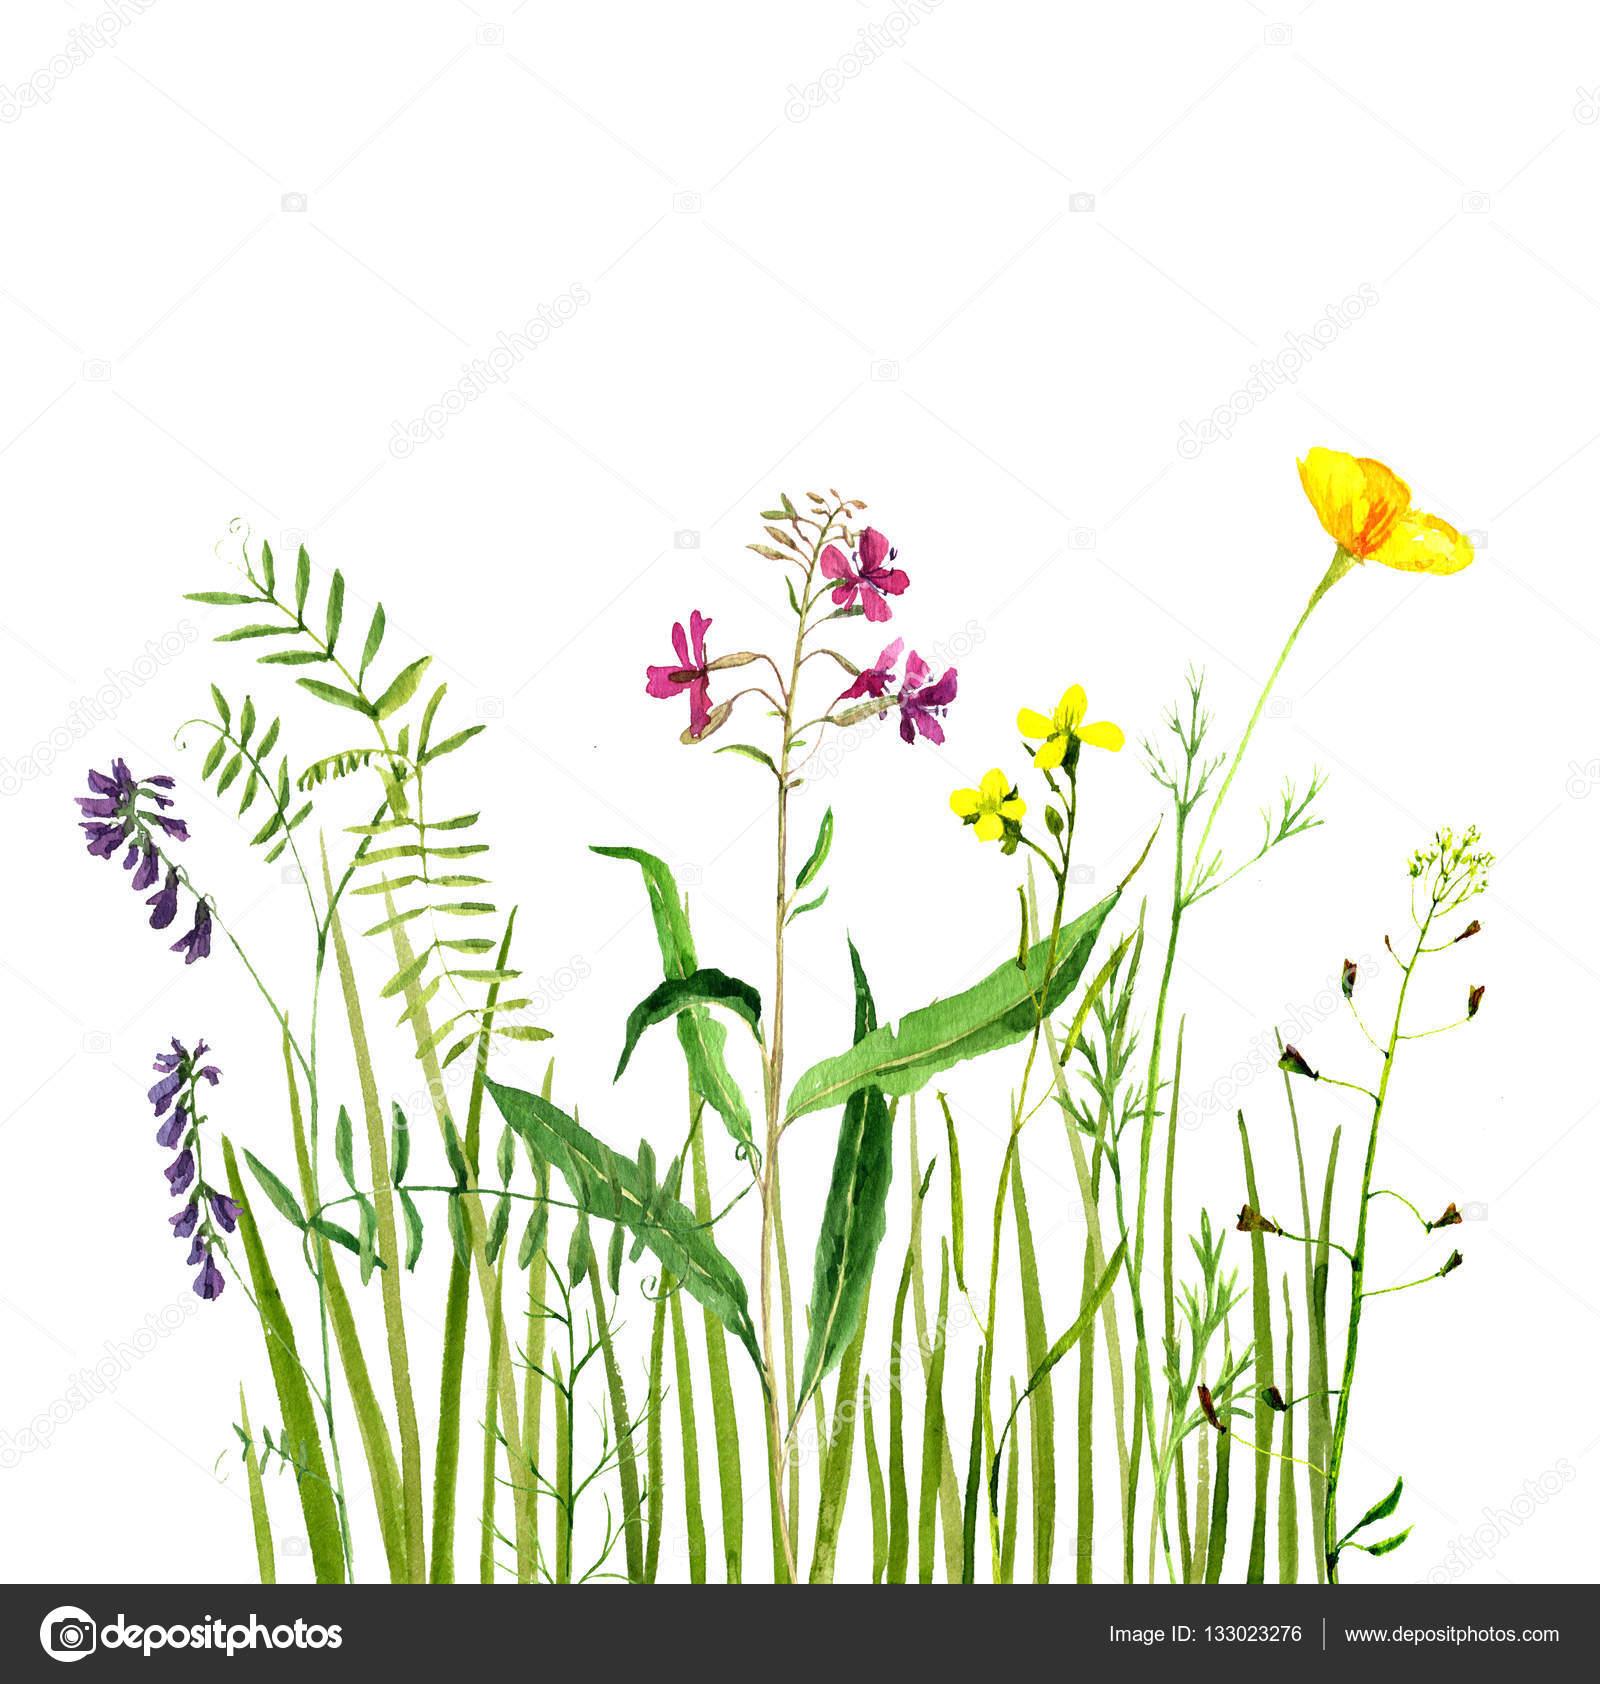 aquarelle dessin fleurs et l herbe verte photographie cat arch angel 133023276. Black Bedroom Furniture Sets. Home Design Ideas